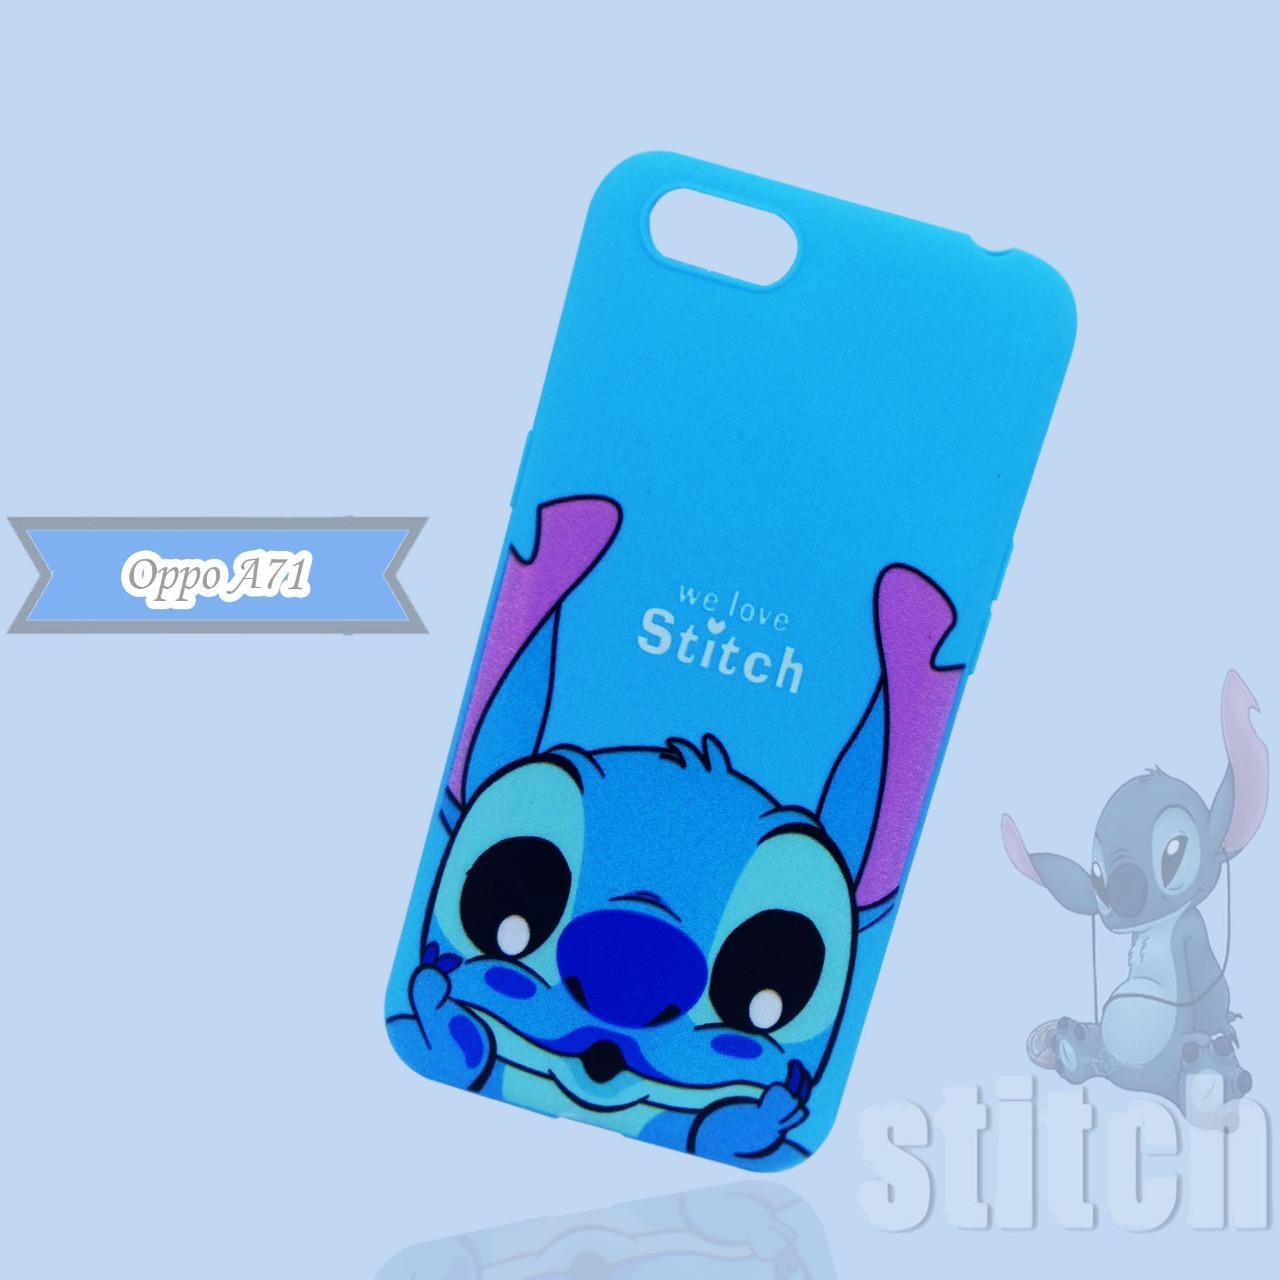 Marintri Case Oppo A71 New Fashion Stitch Cute